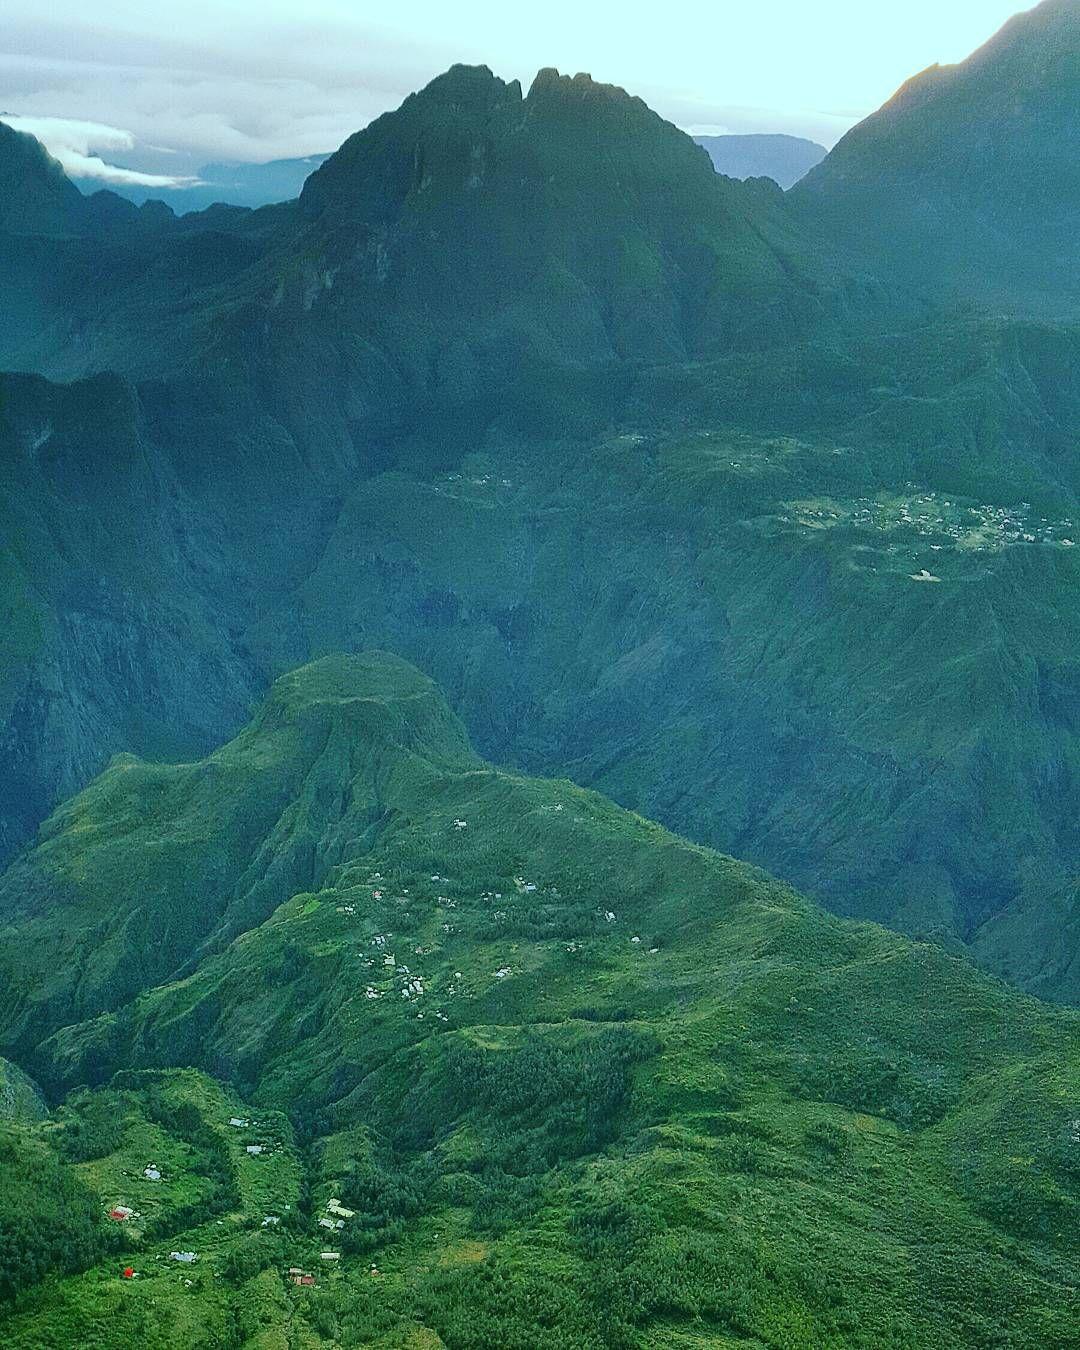 #reunionisland #reunion #lareunion #cirquedemafate #mafate #landscape #maïdo #maido #pointdevuedumaido #2200m #mountains by boubouboule